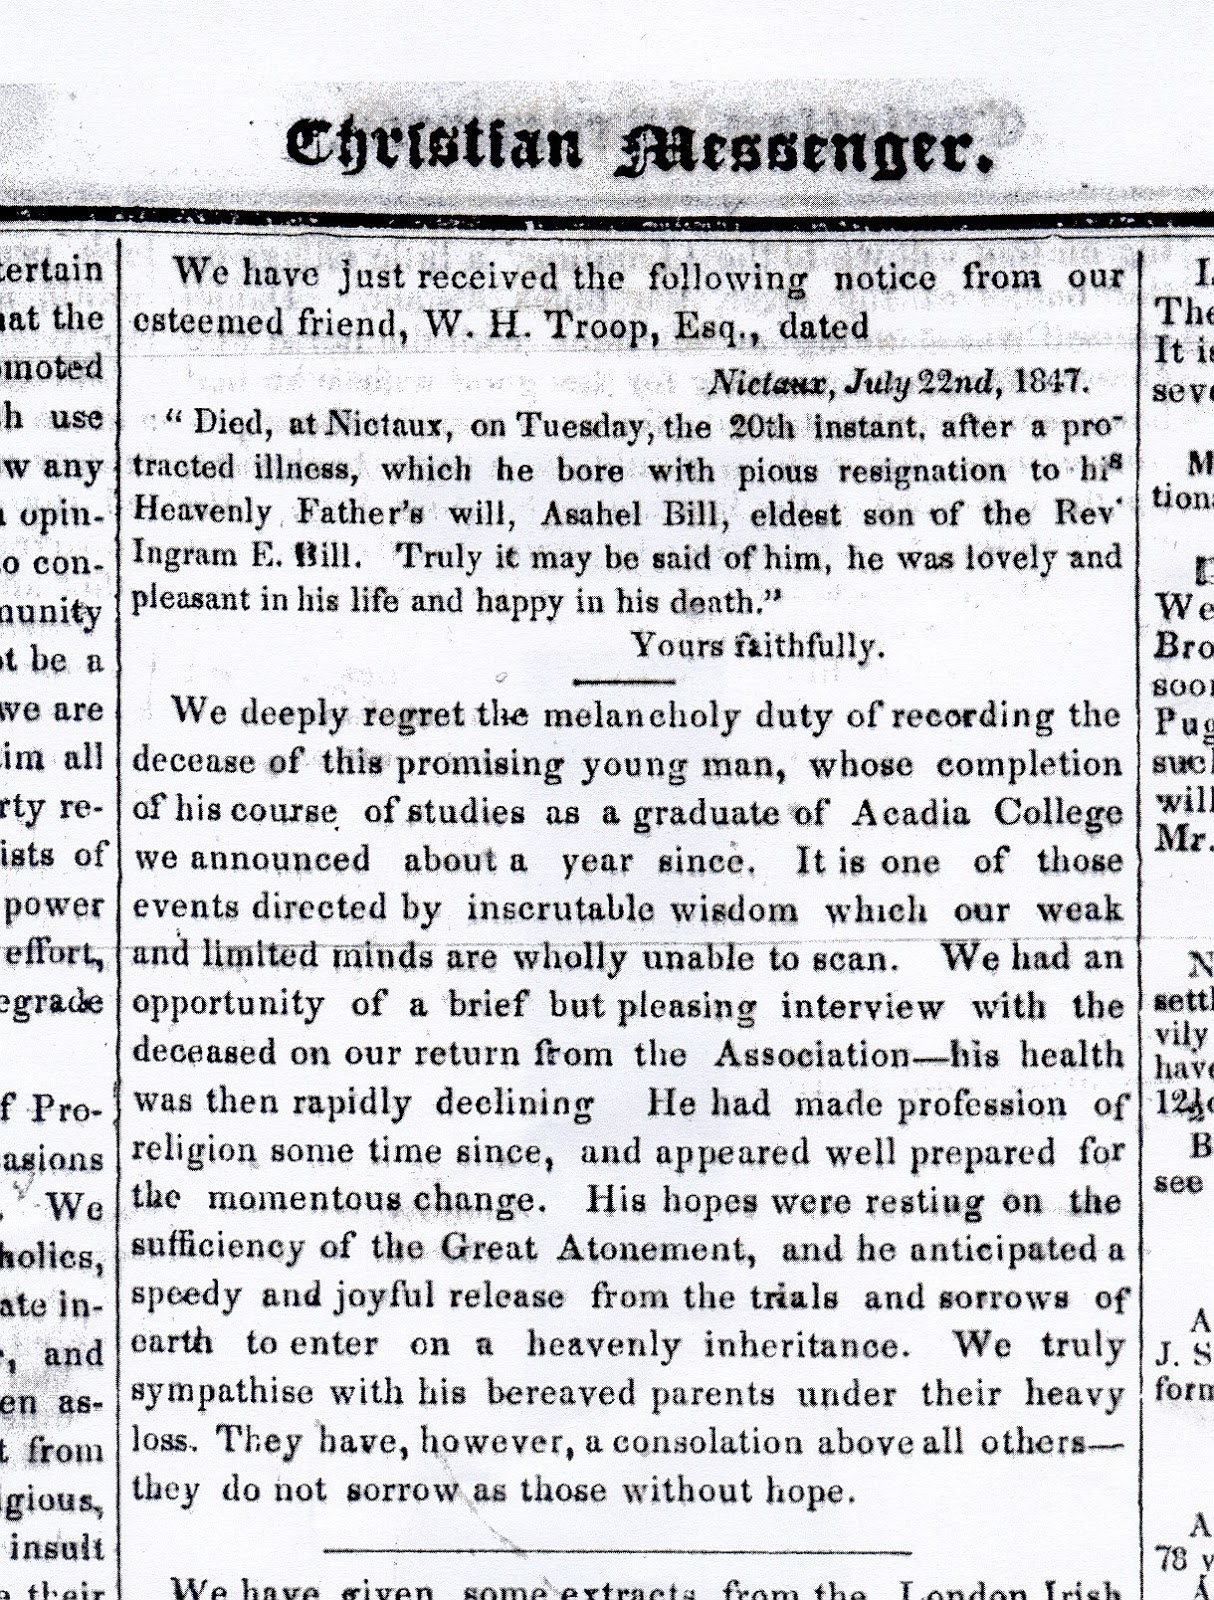 Nutfield Genealogy: Asahel Bill, Death Notice 1847